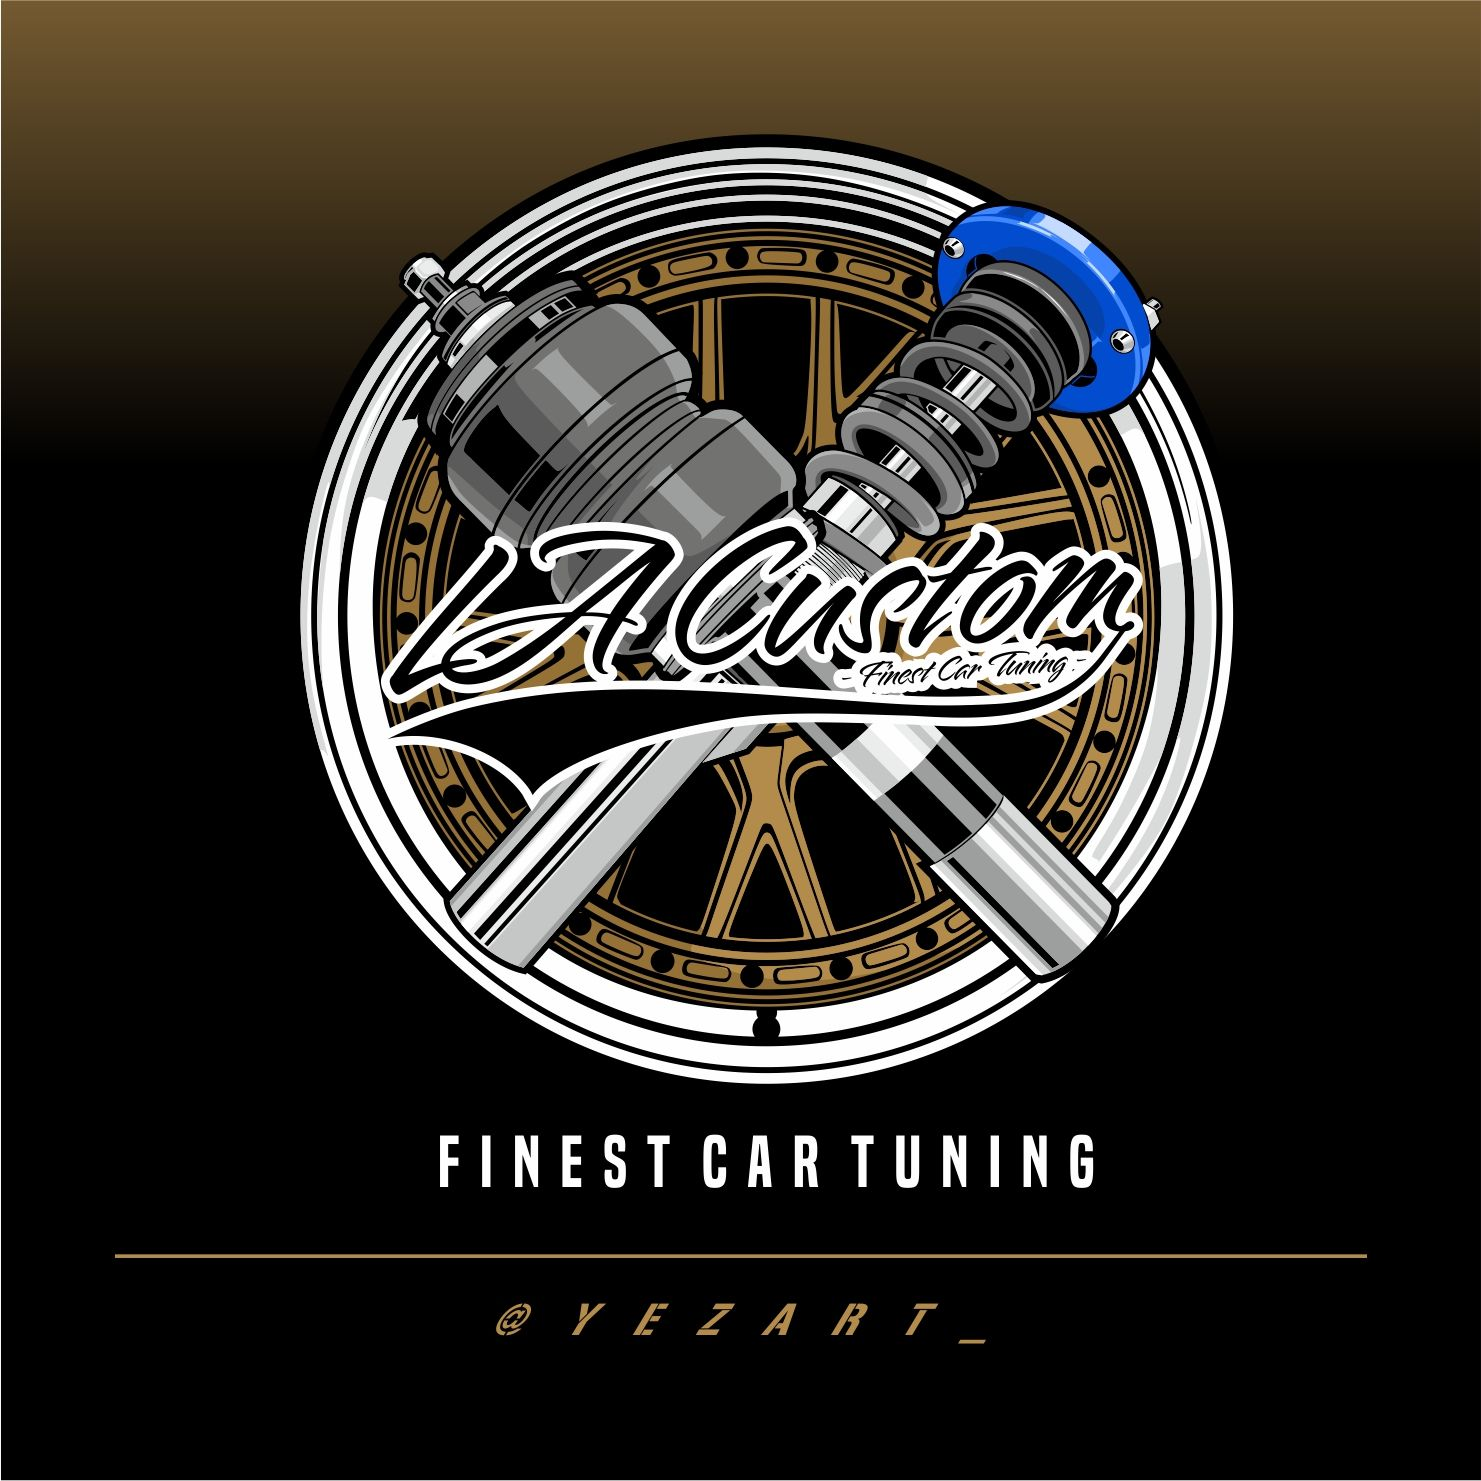 Air Suspension Finest Car Tuning T Shirt